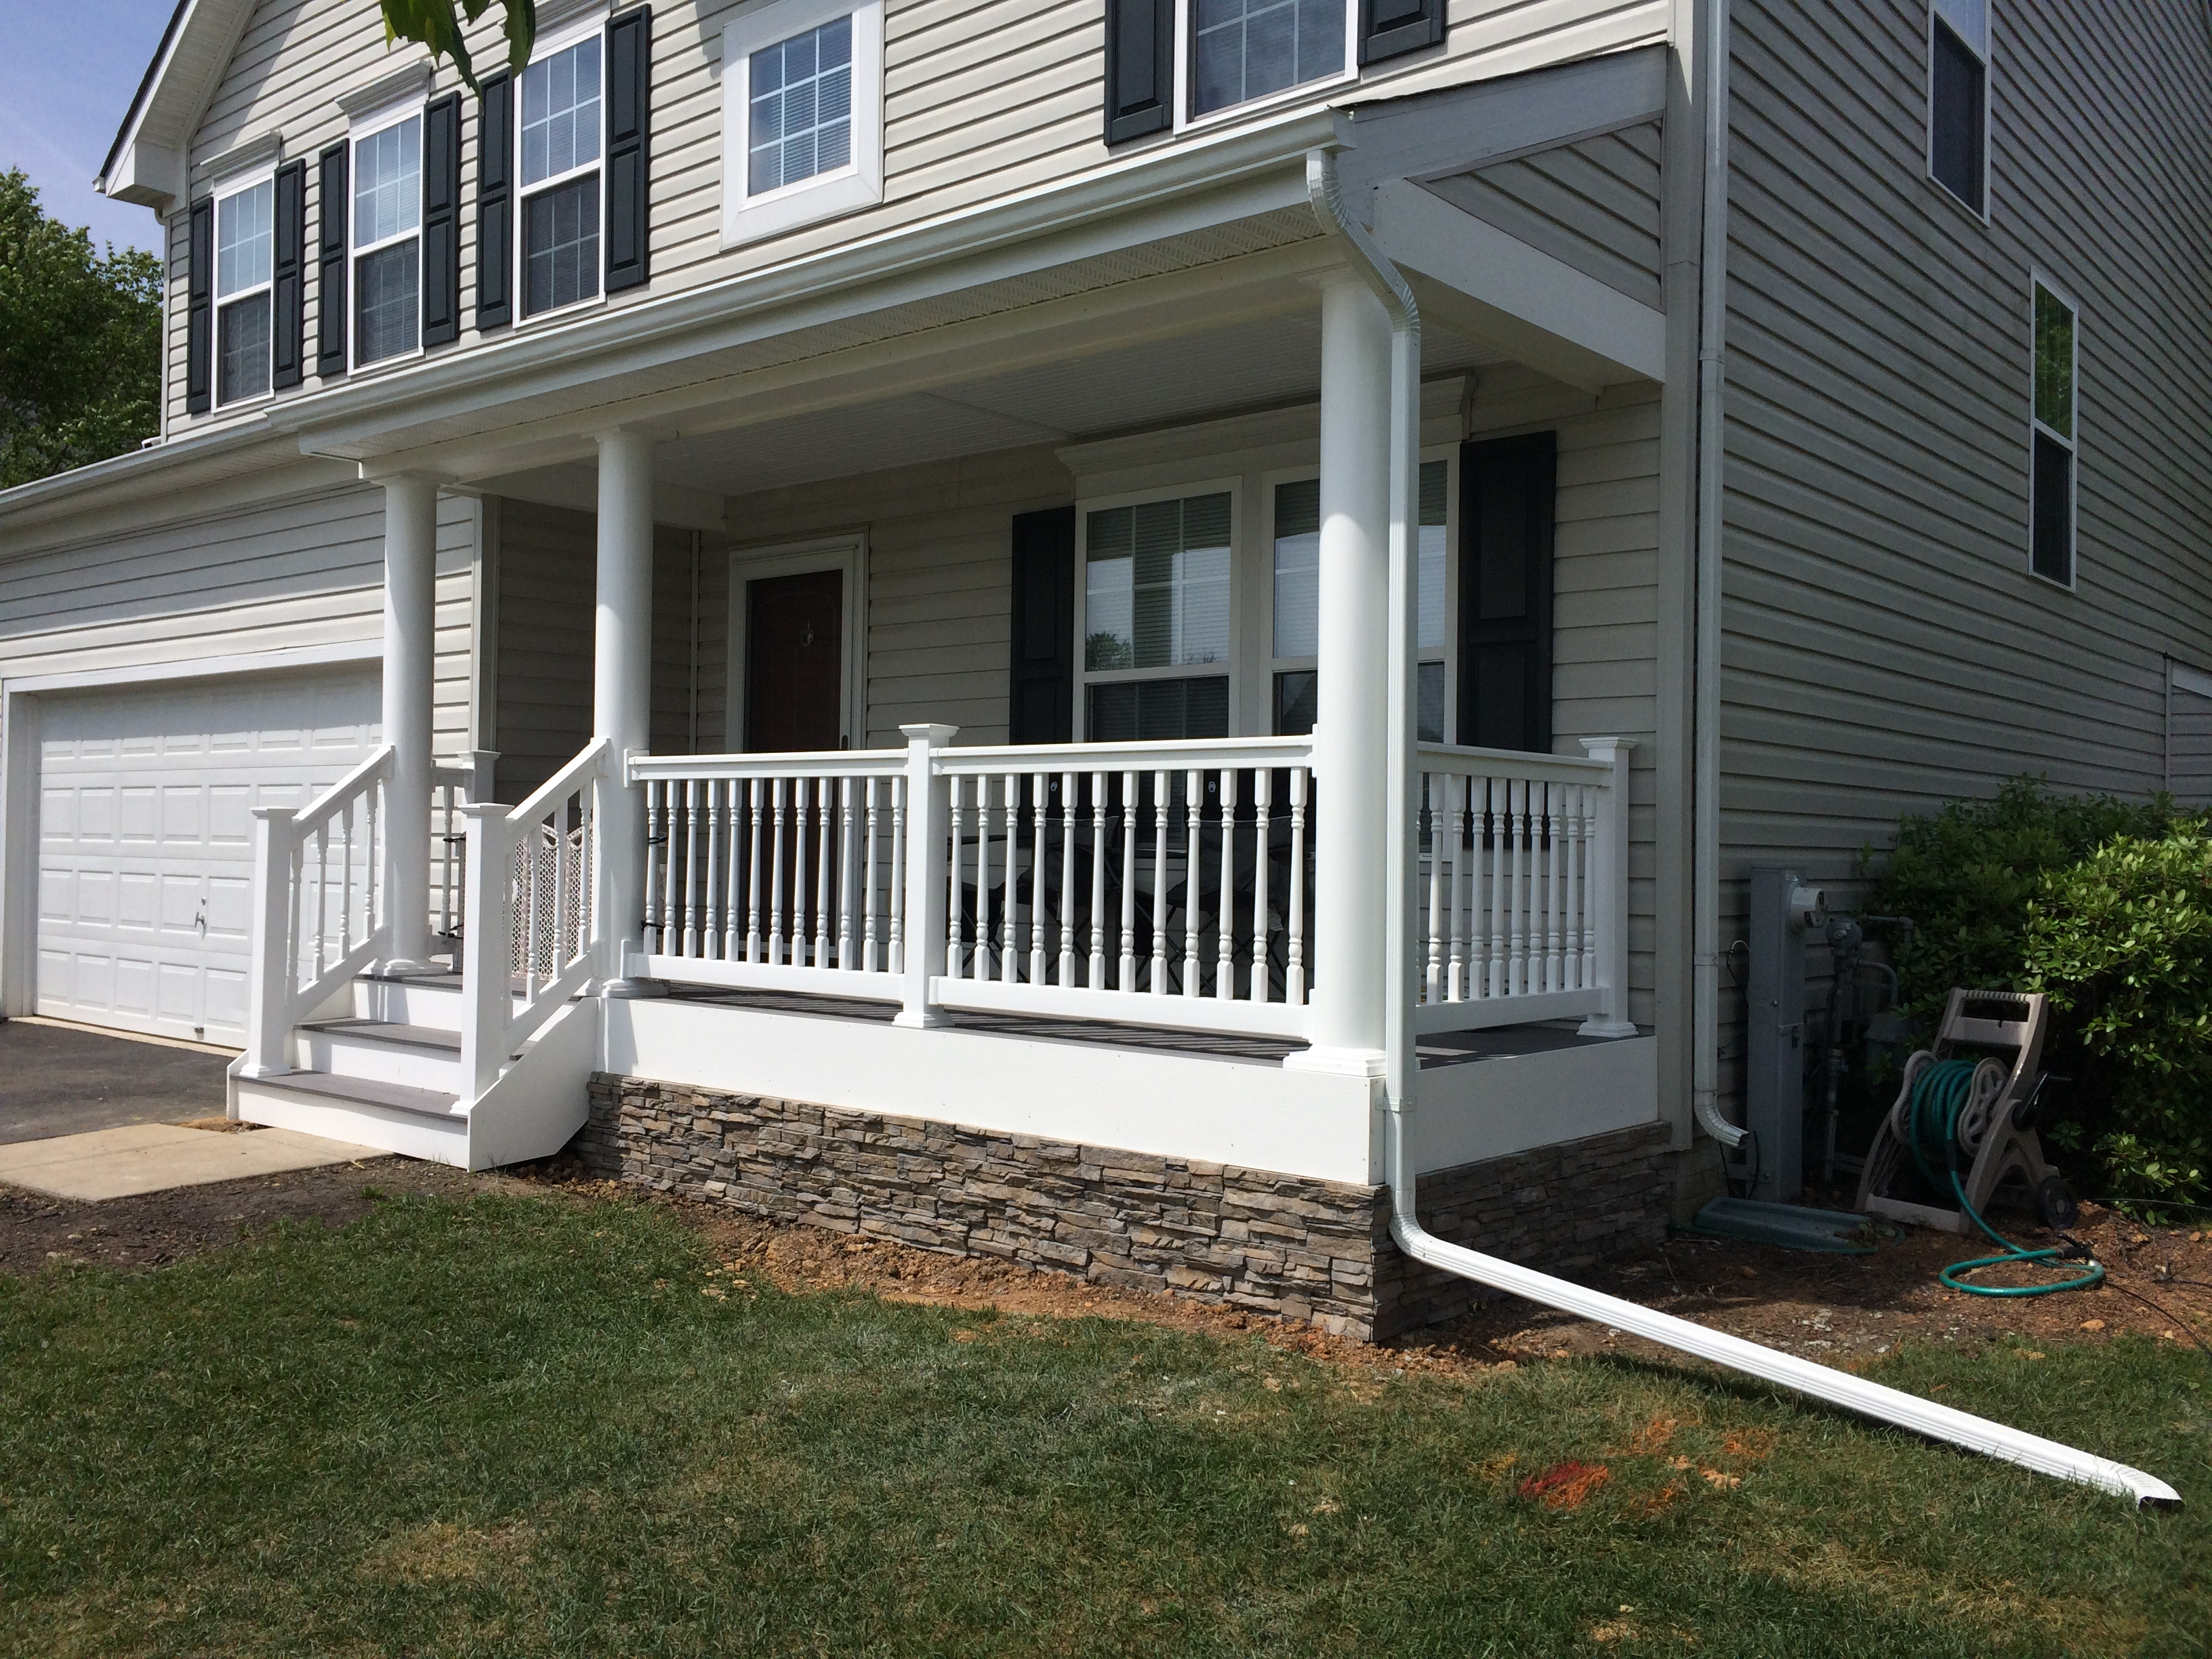 Slate Gray Porch with Round Columns, Lexington Railing, and Stone Siding